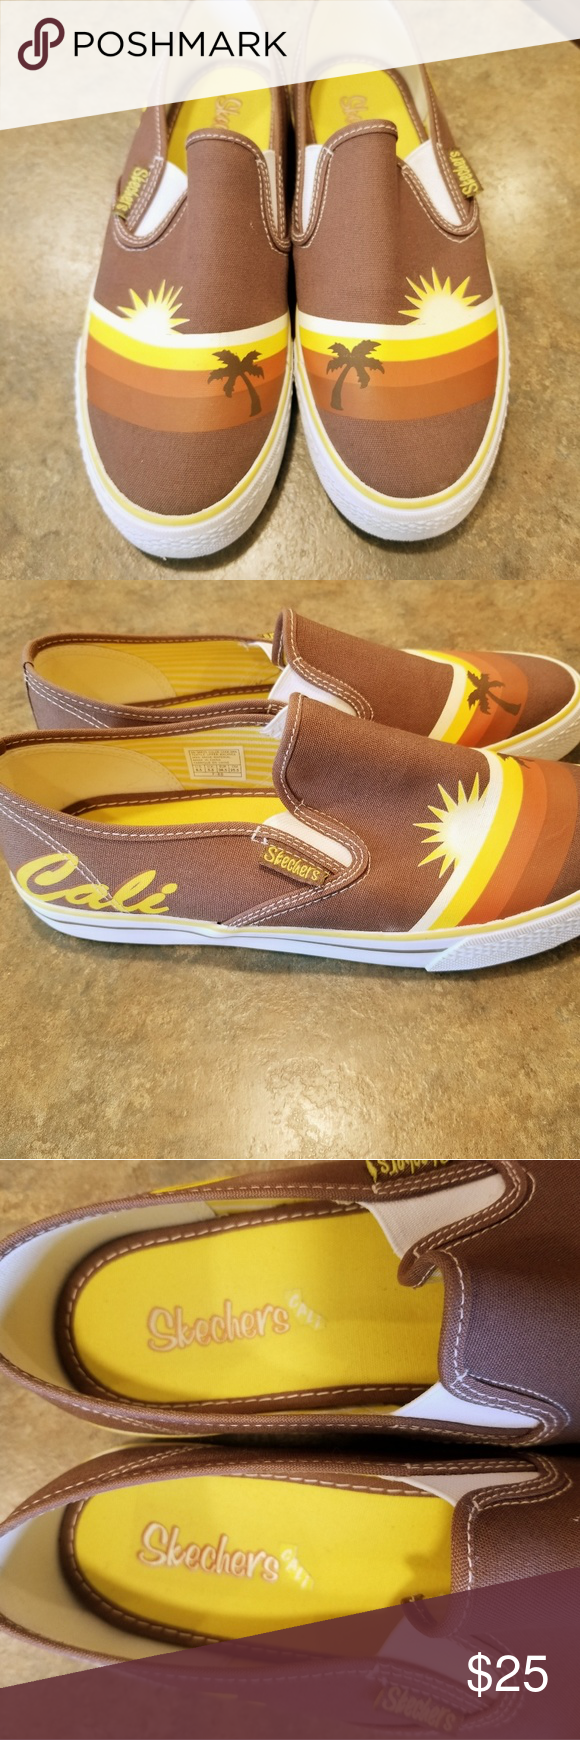 Skechers Cali Slip Ons With Images Skechers Slip On Skechers